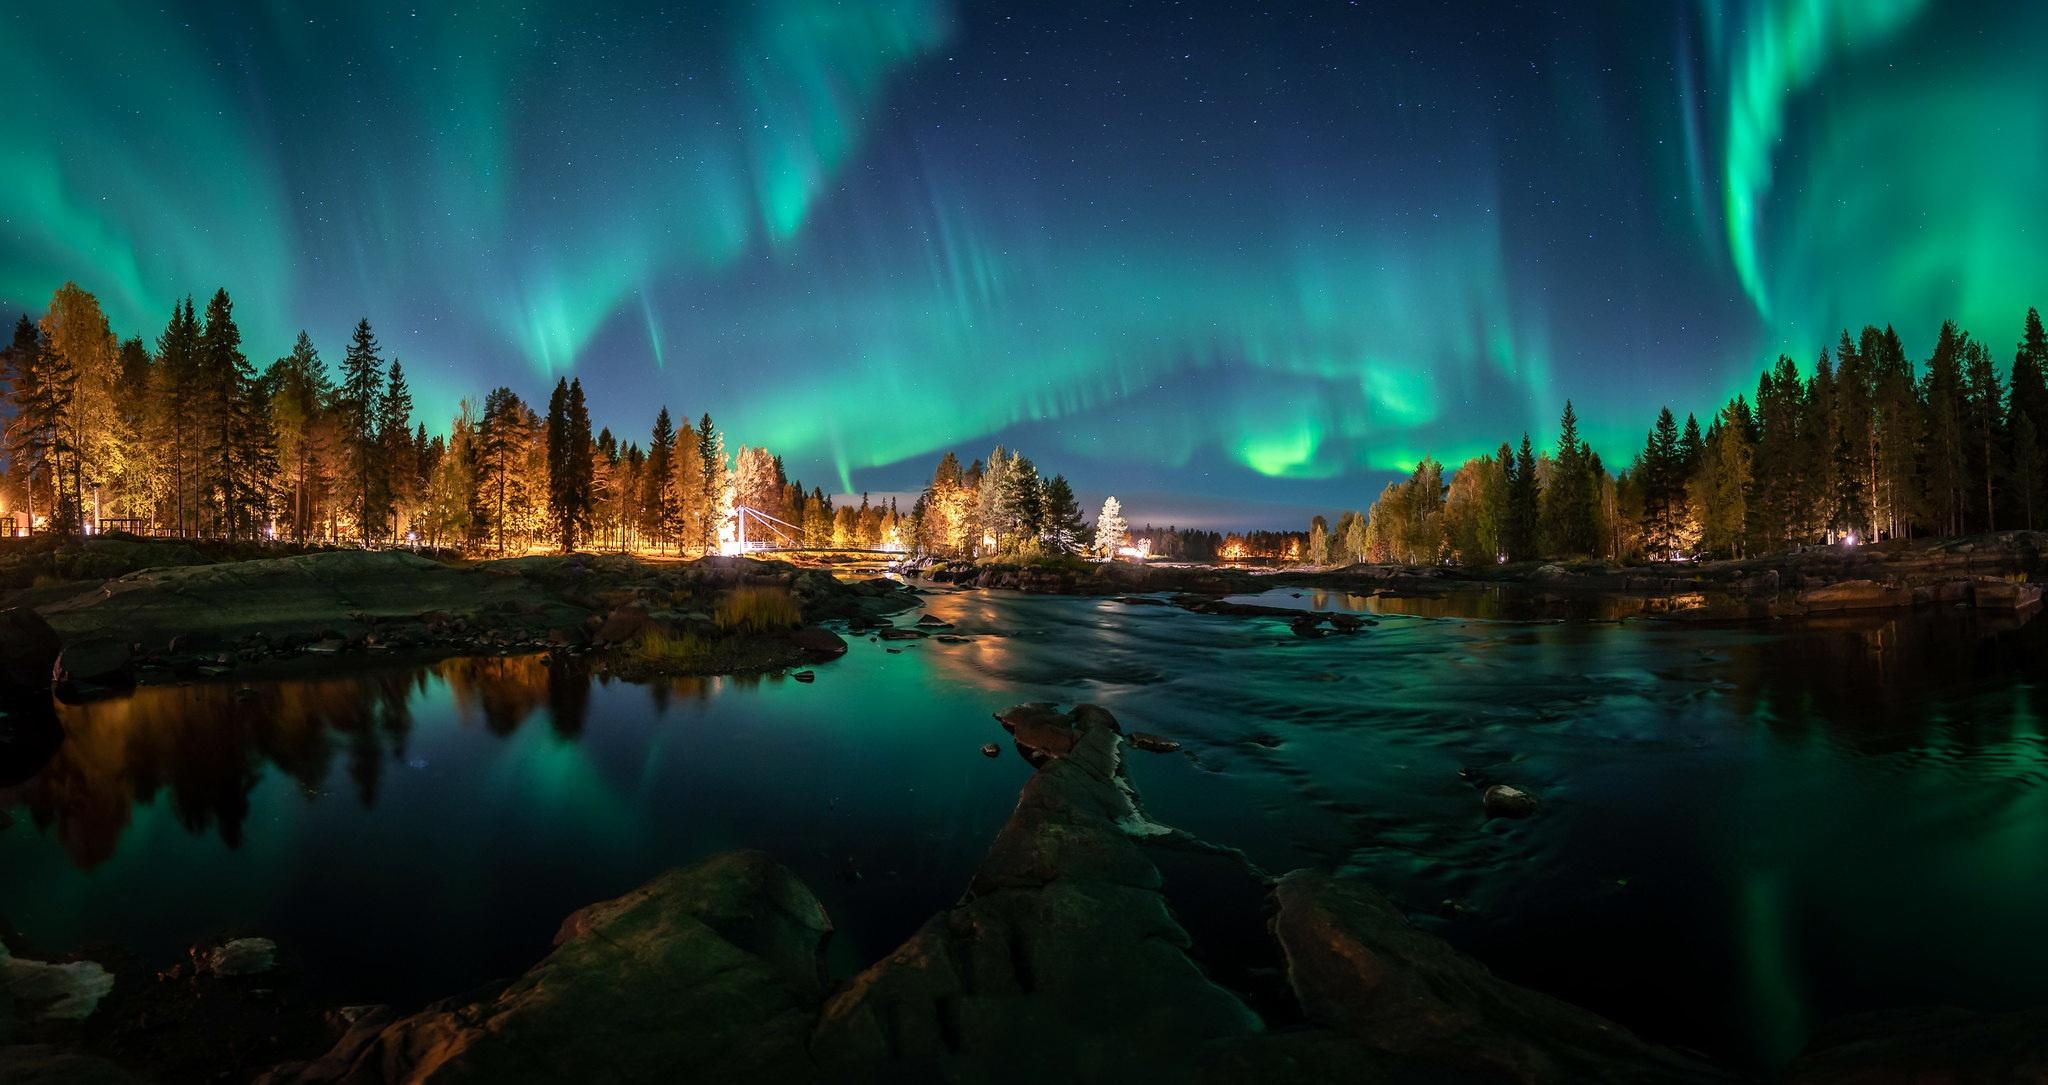 Aurora Borealis Finland Light Nature Wallpaper 2048x1085 Download Hd Wallpaper Wallpapertip